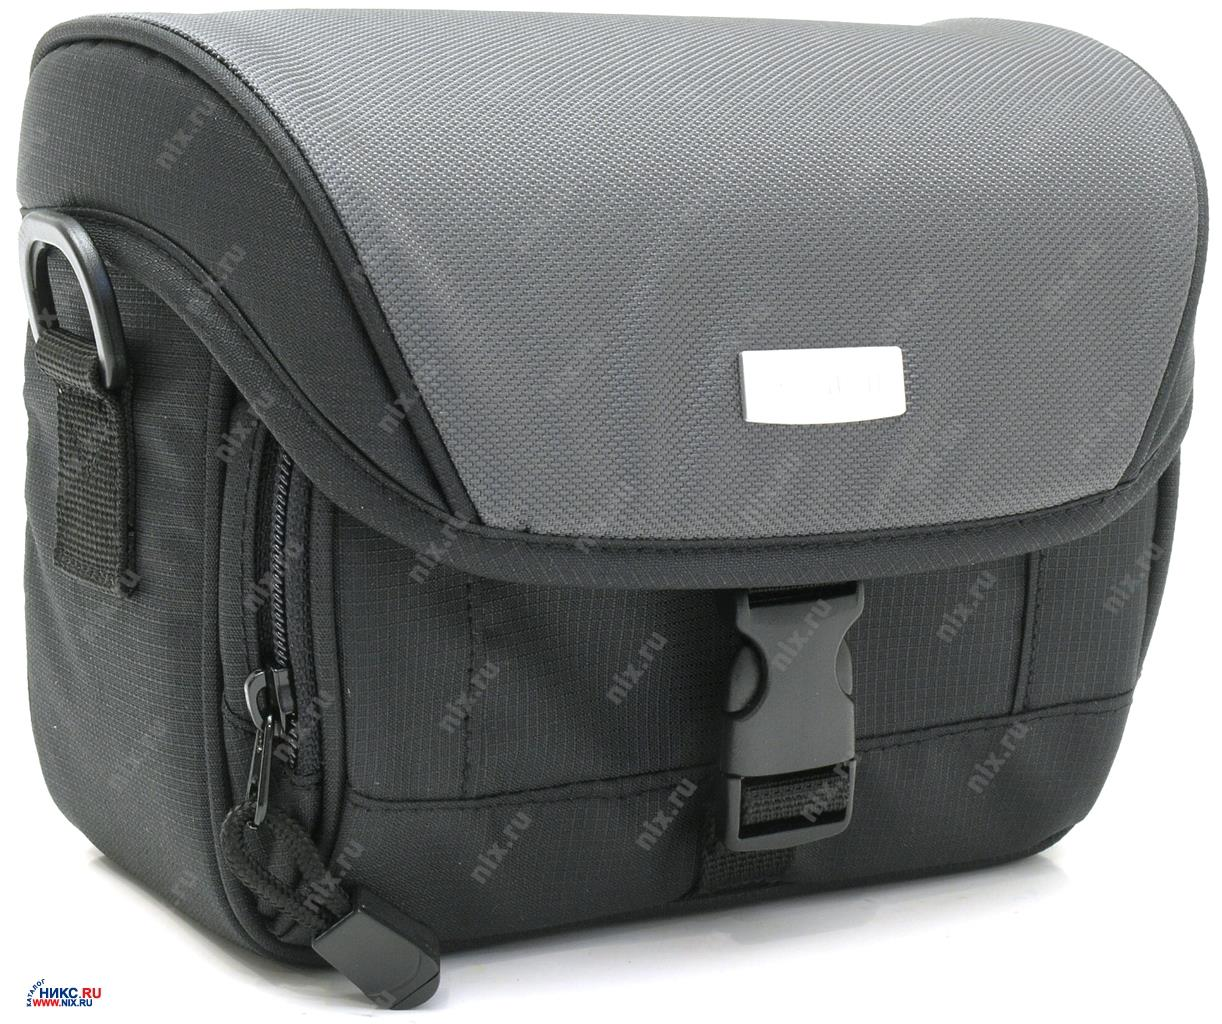 73905f45e0bf Видеокамера Canon MV920 — купить, цена и характеристики, отзывы